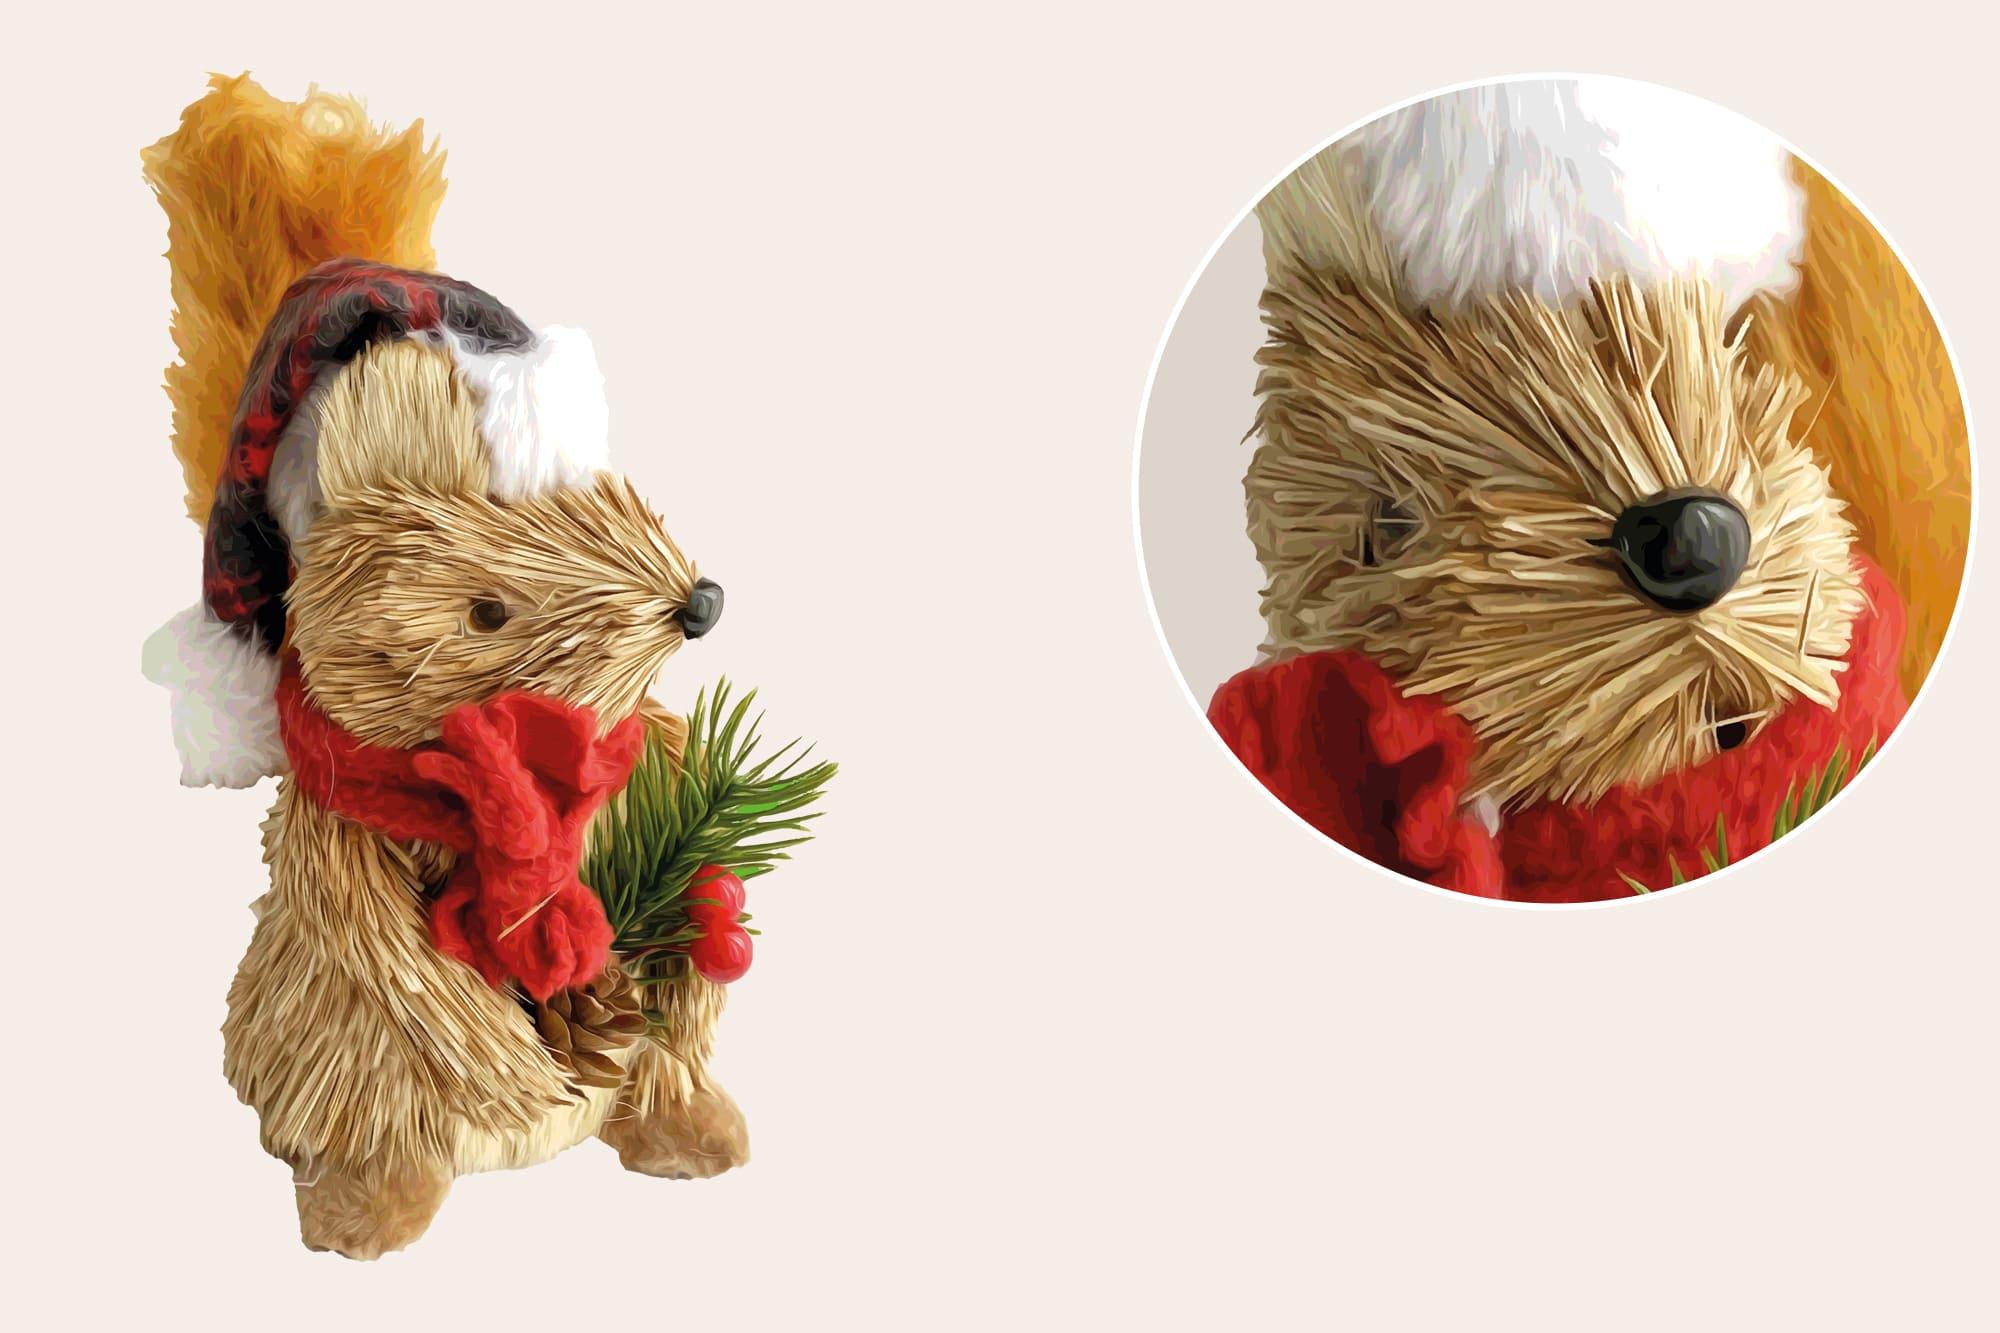 496 Christmas Illustrations: Christmas Vectors Bundle SVG, EPS, AI - Squirrel b